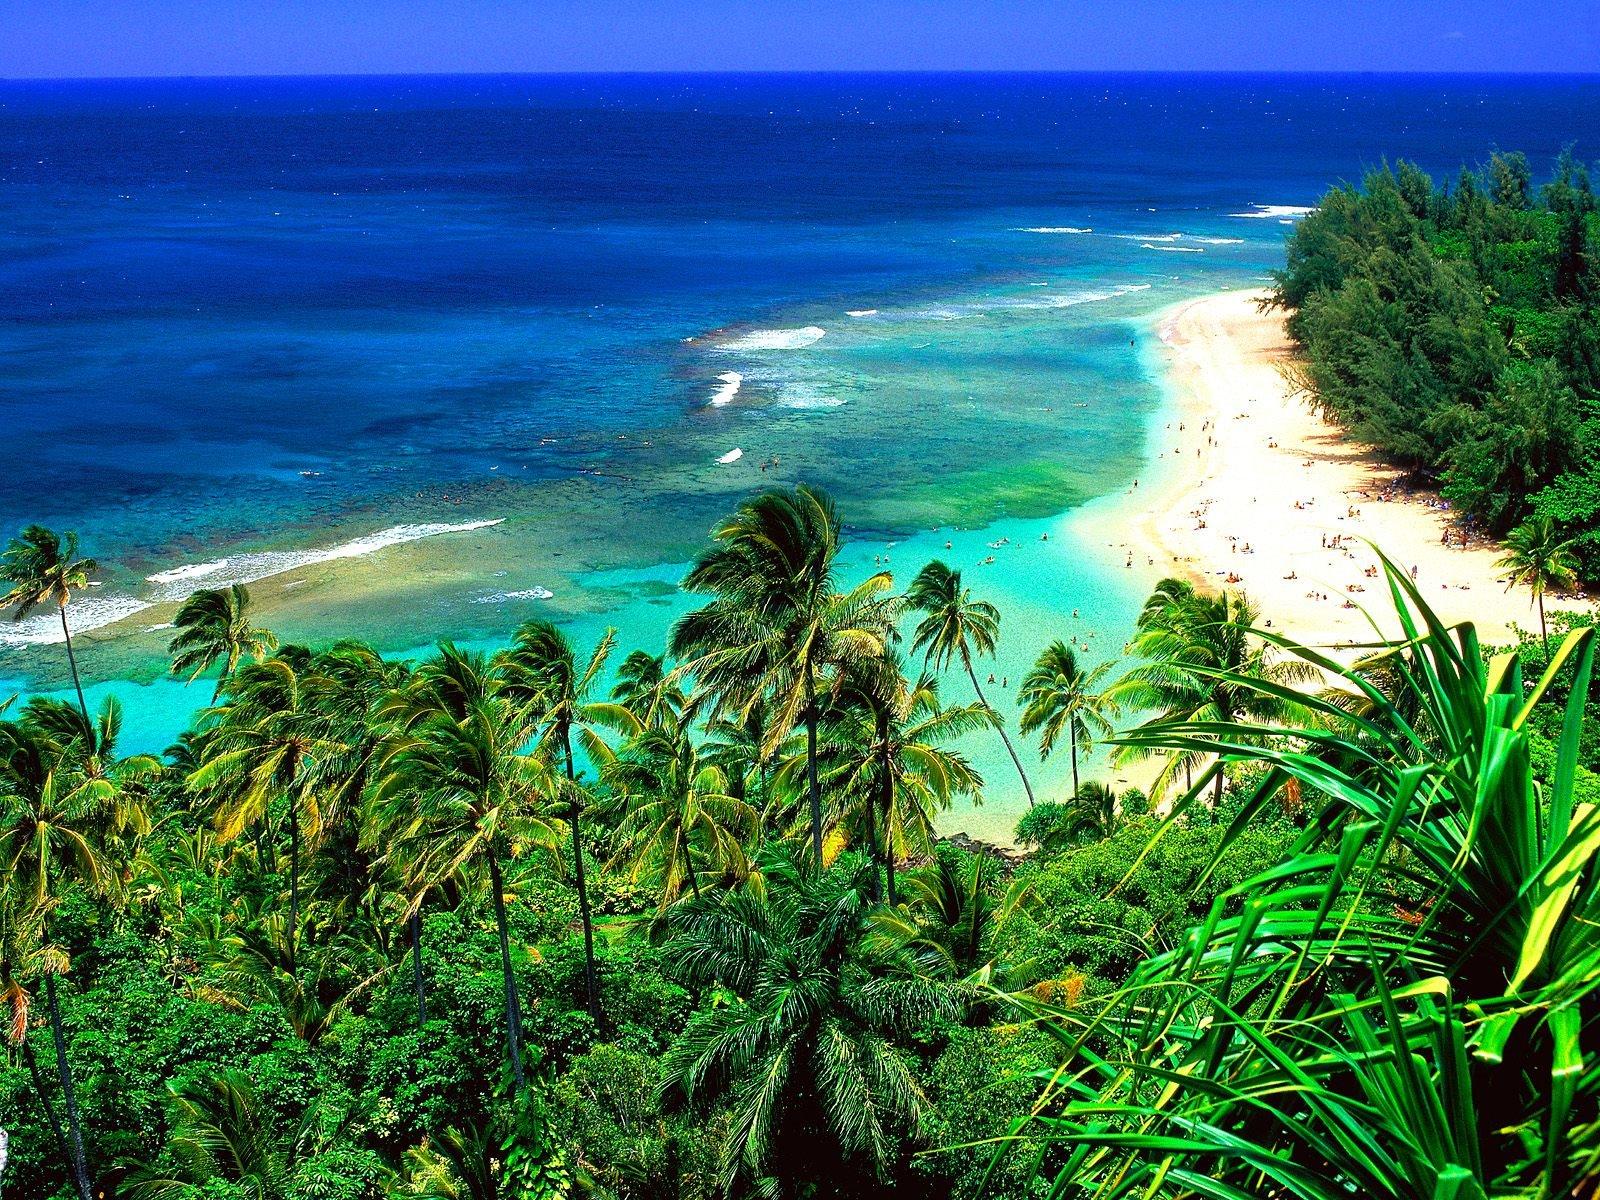 Kee-Beach-Kauai-hawaii-23339712-1600-1200